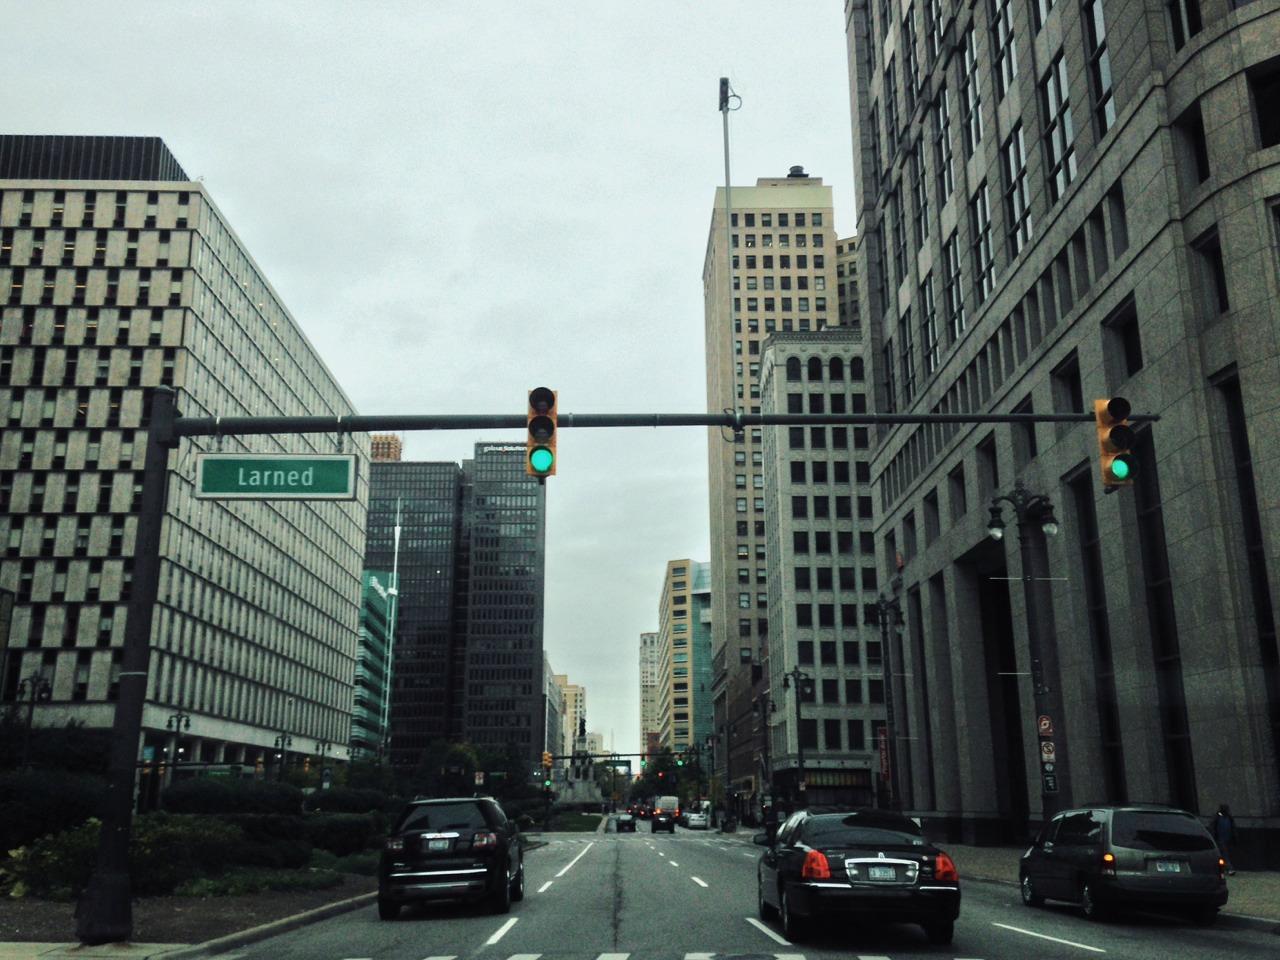 Detroit proper.